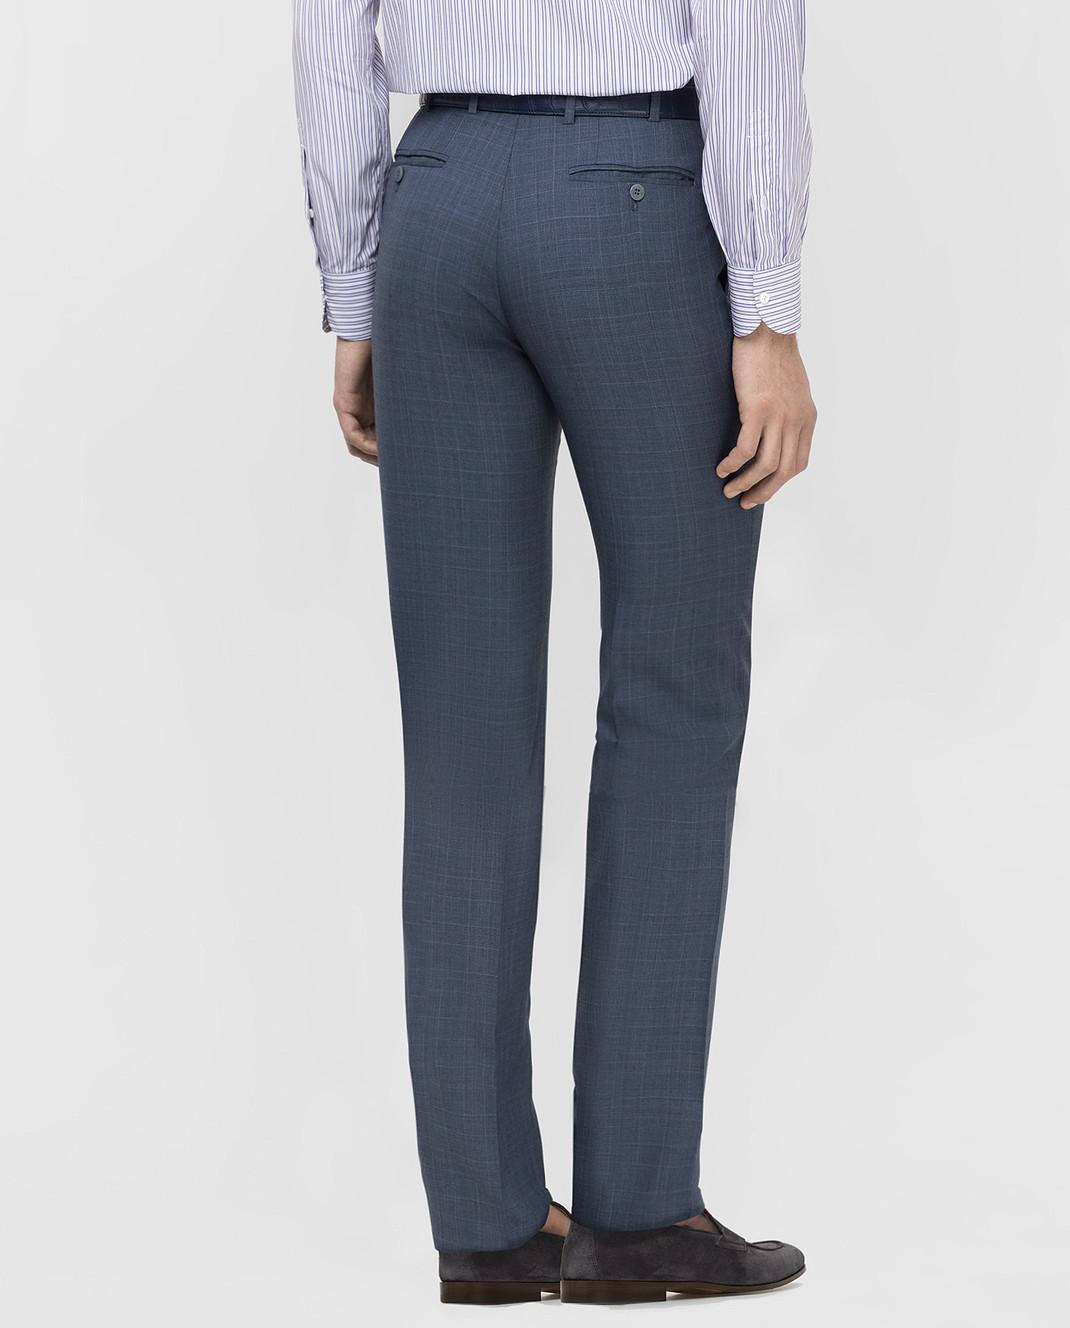 ISAIA Синие брюки из шерсти 0073153629F изображение 4